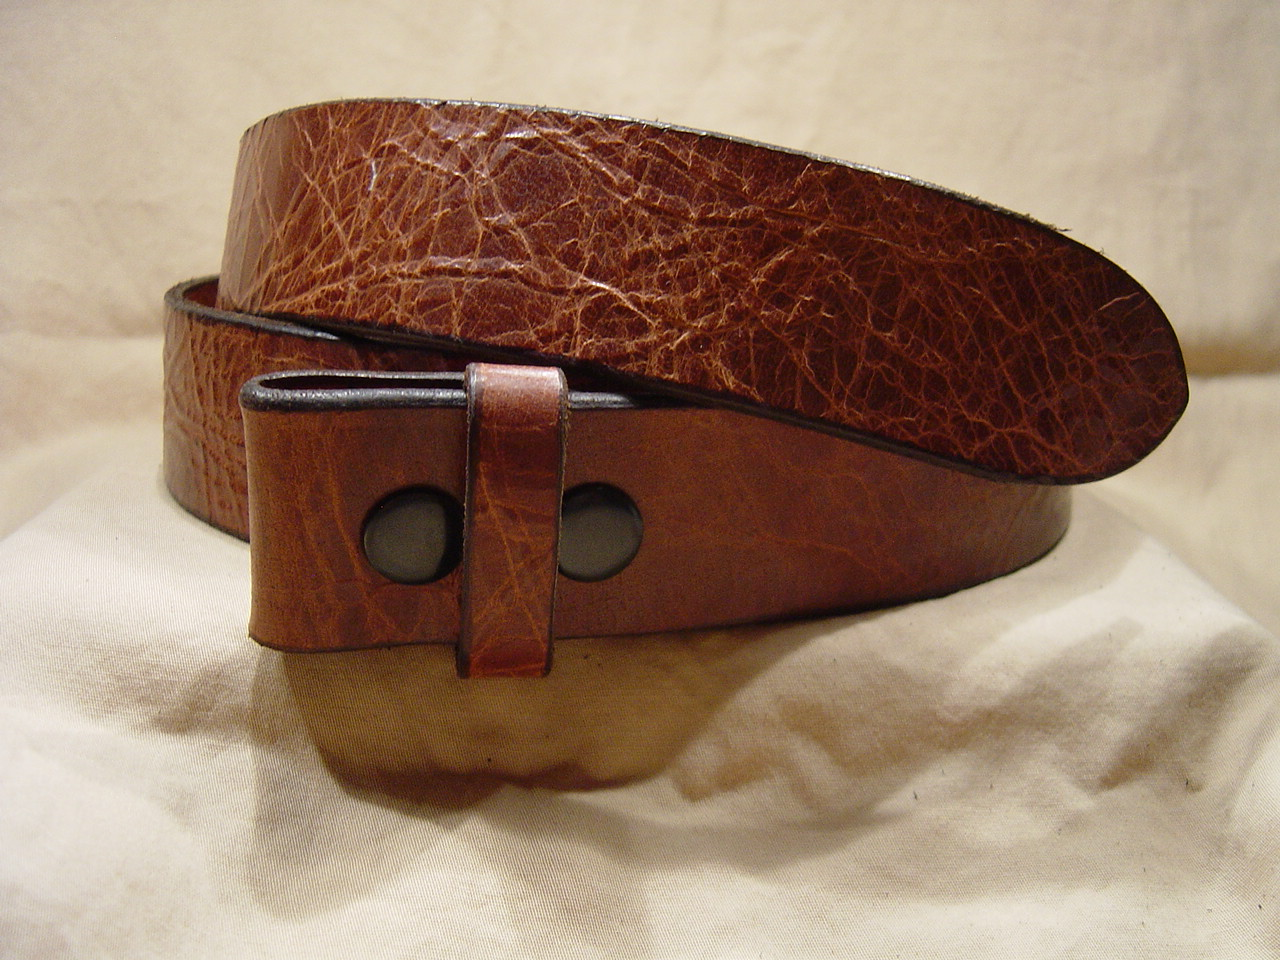 Antique tan leather belt